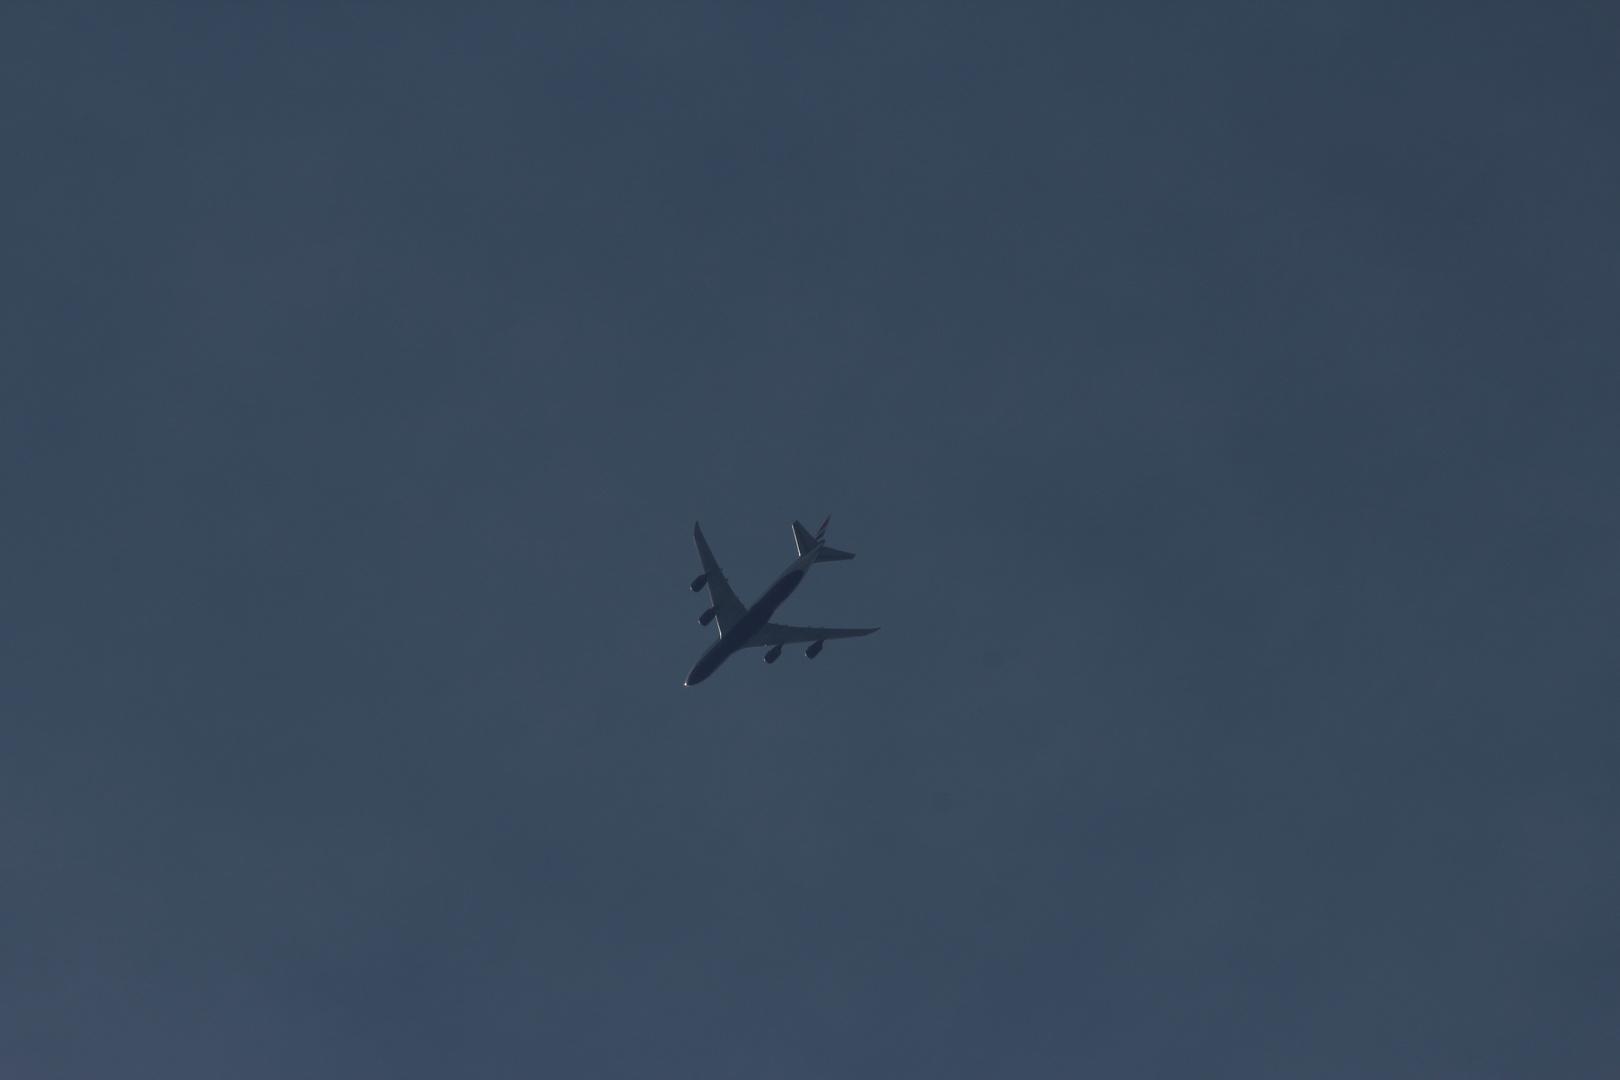 747 Landung Dortmund?????